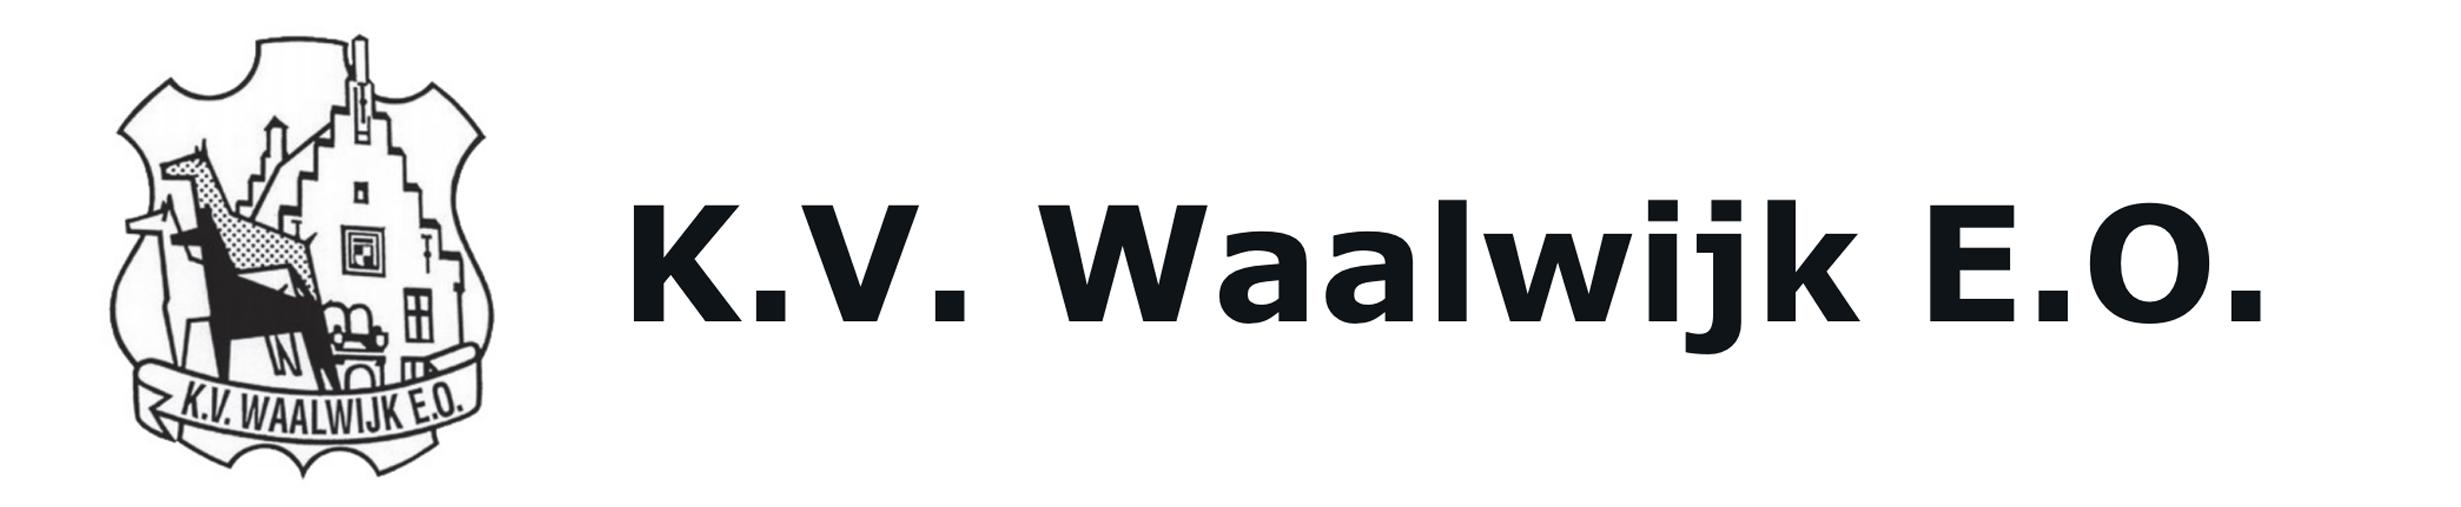 KV Waalwijk